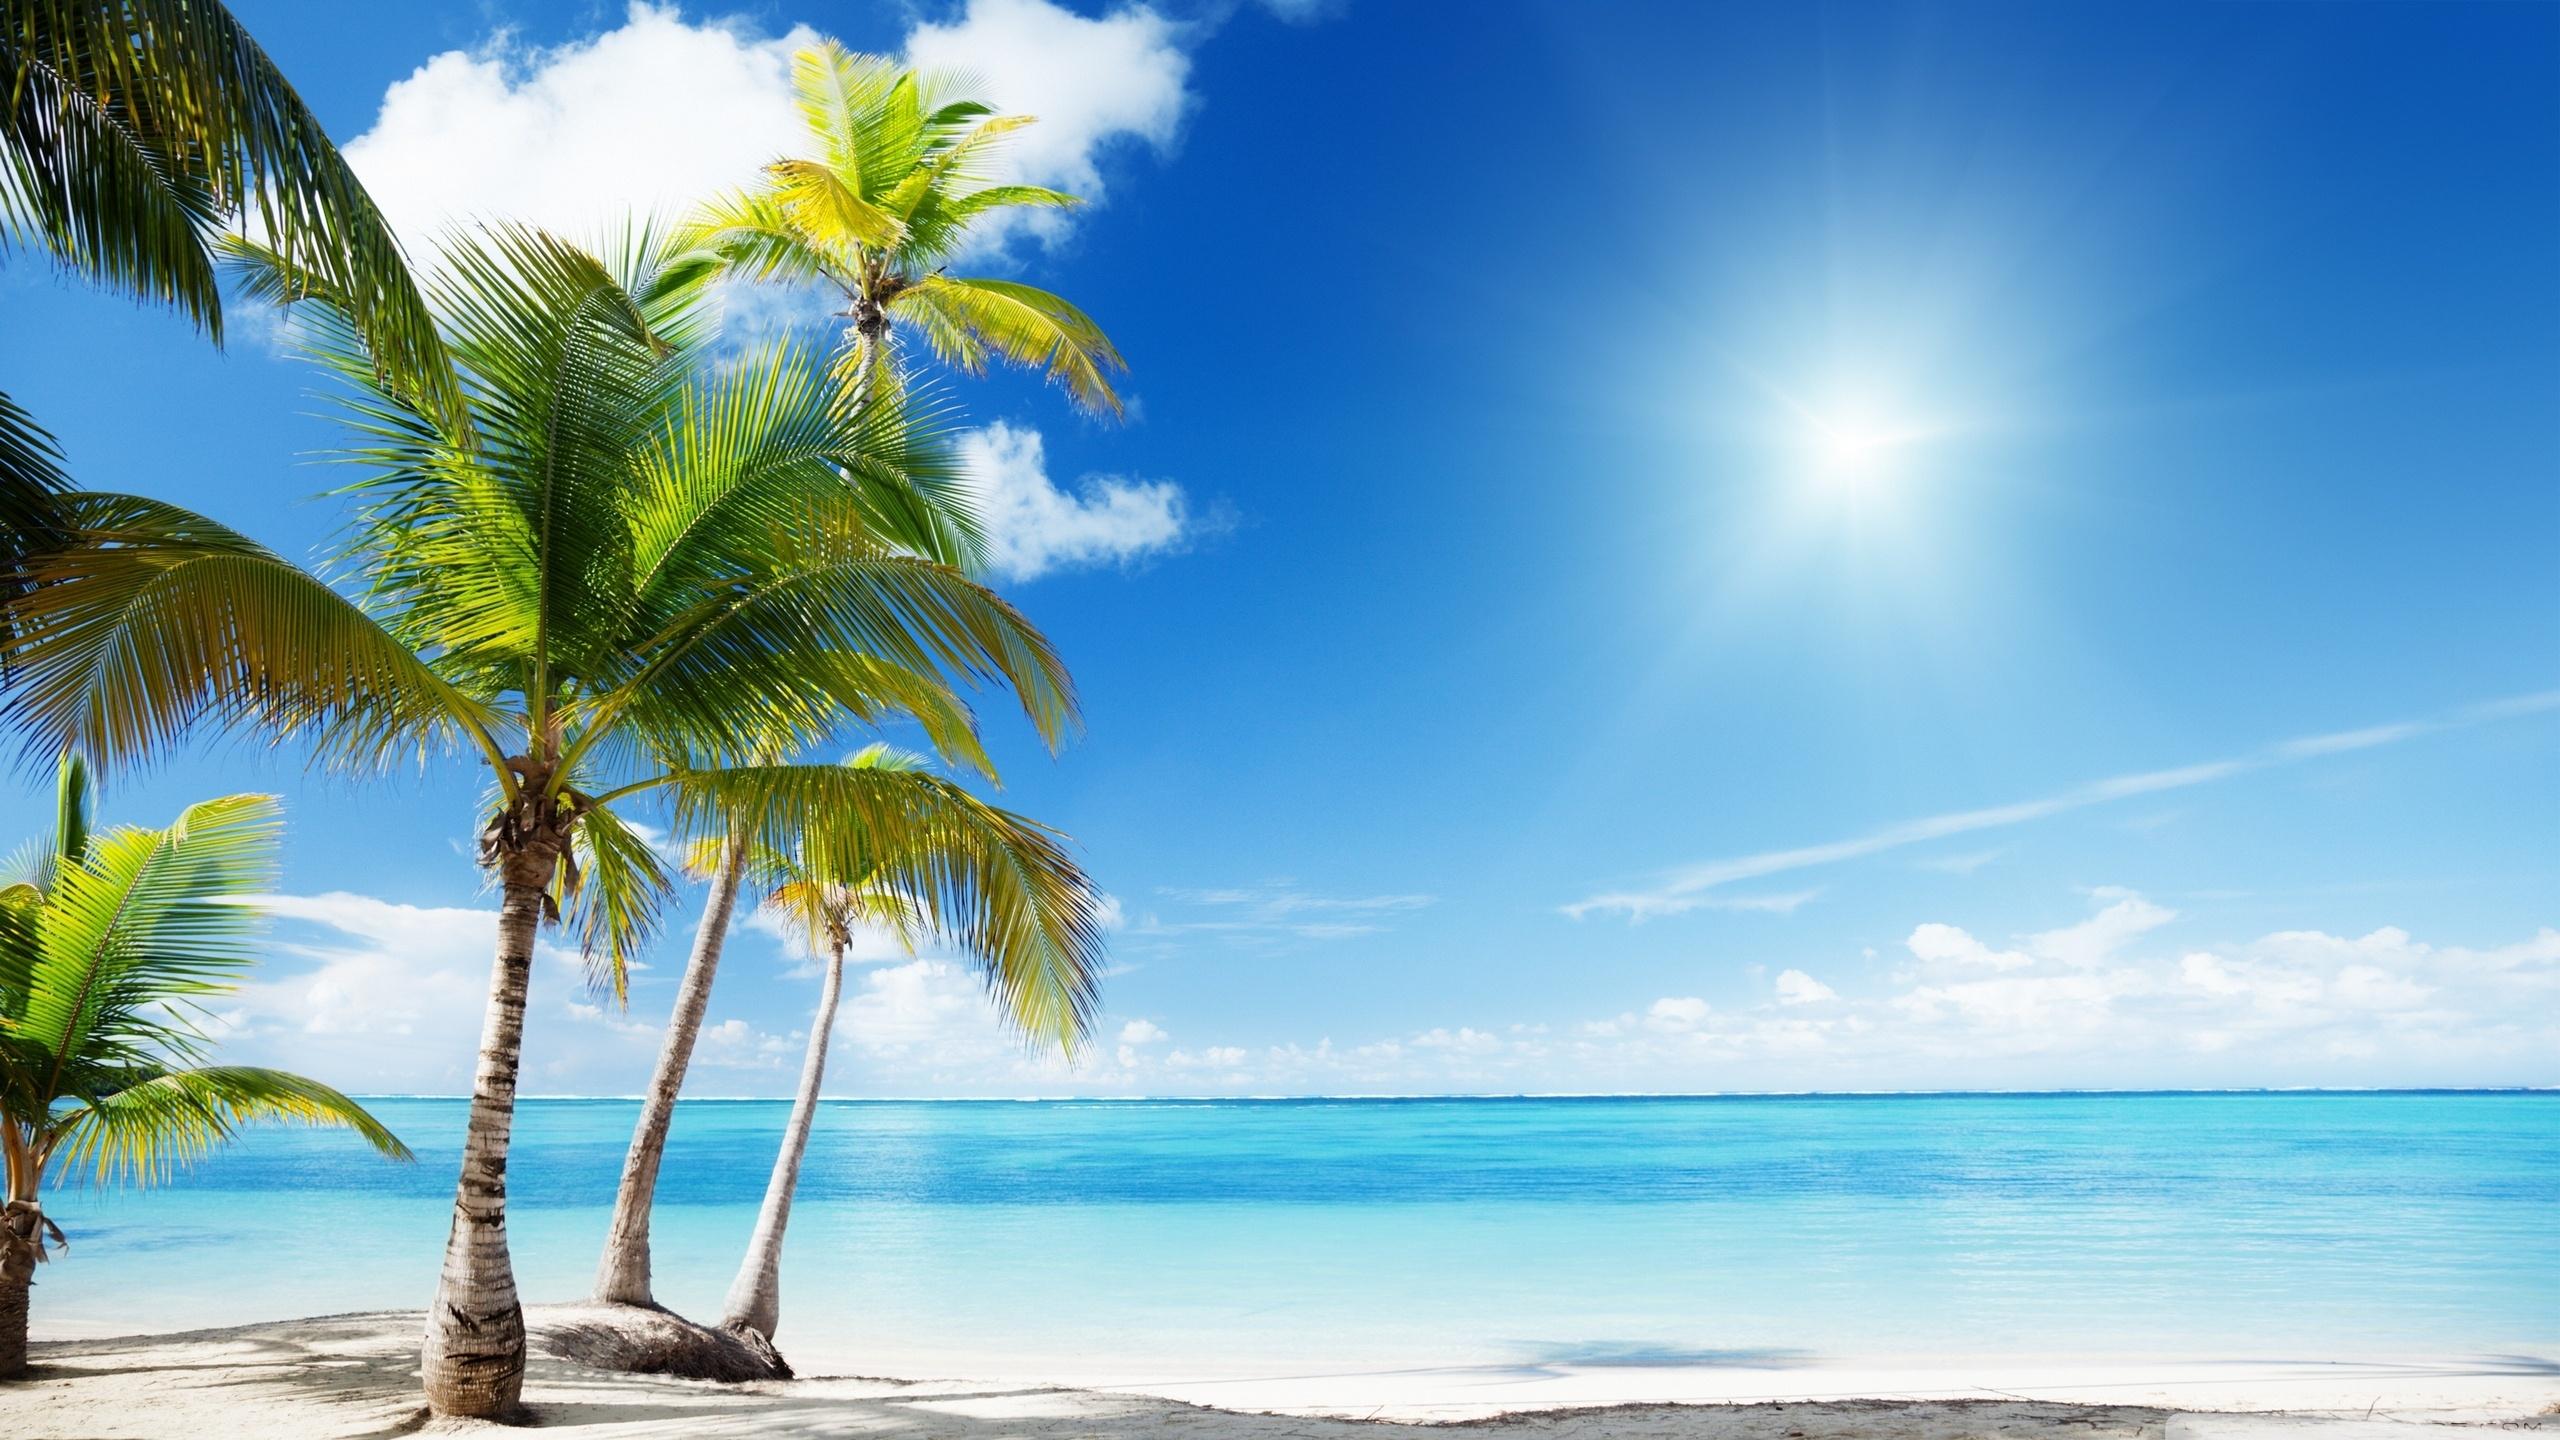 tropical beach paradise ❤ 4k hd desktop wallpaper for 4k ultra hd